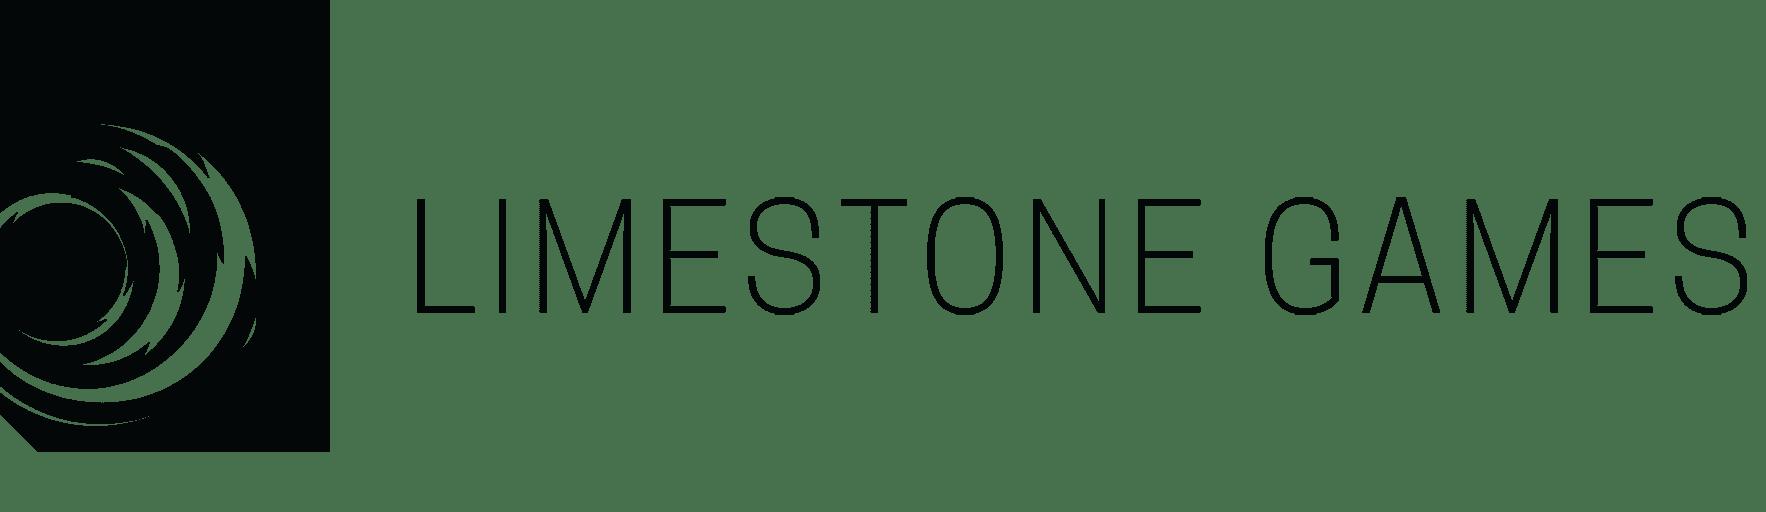 Limestone Games